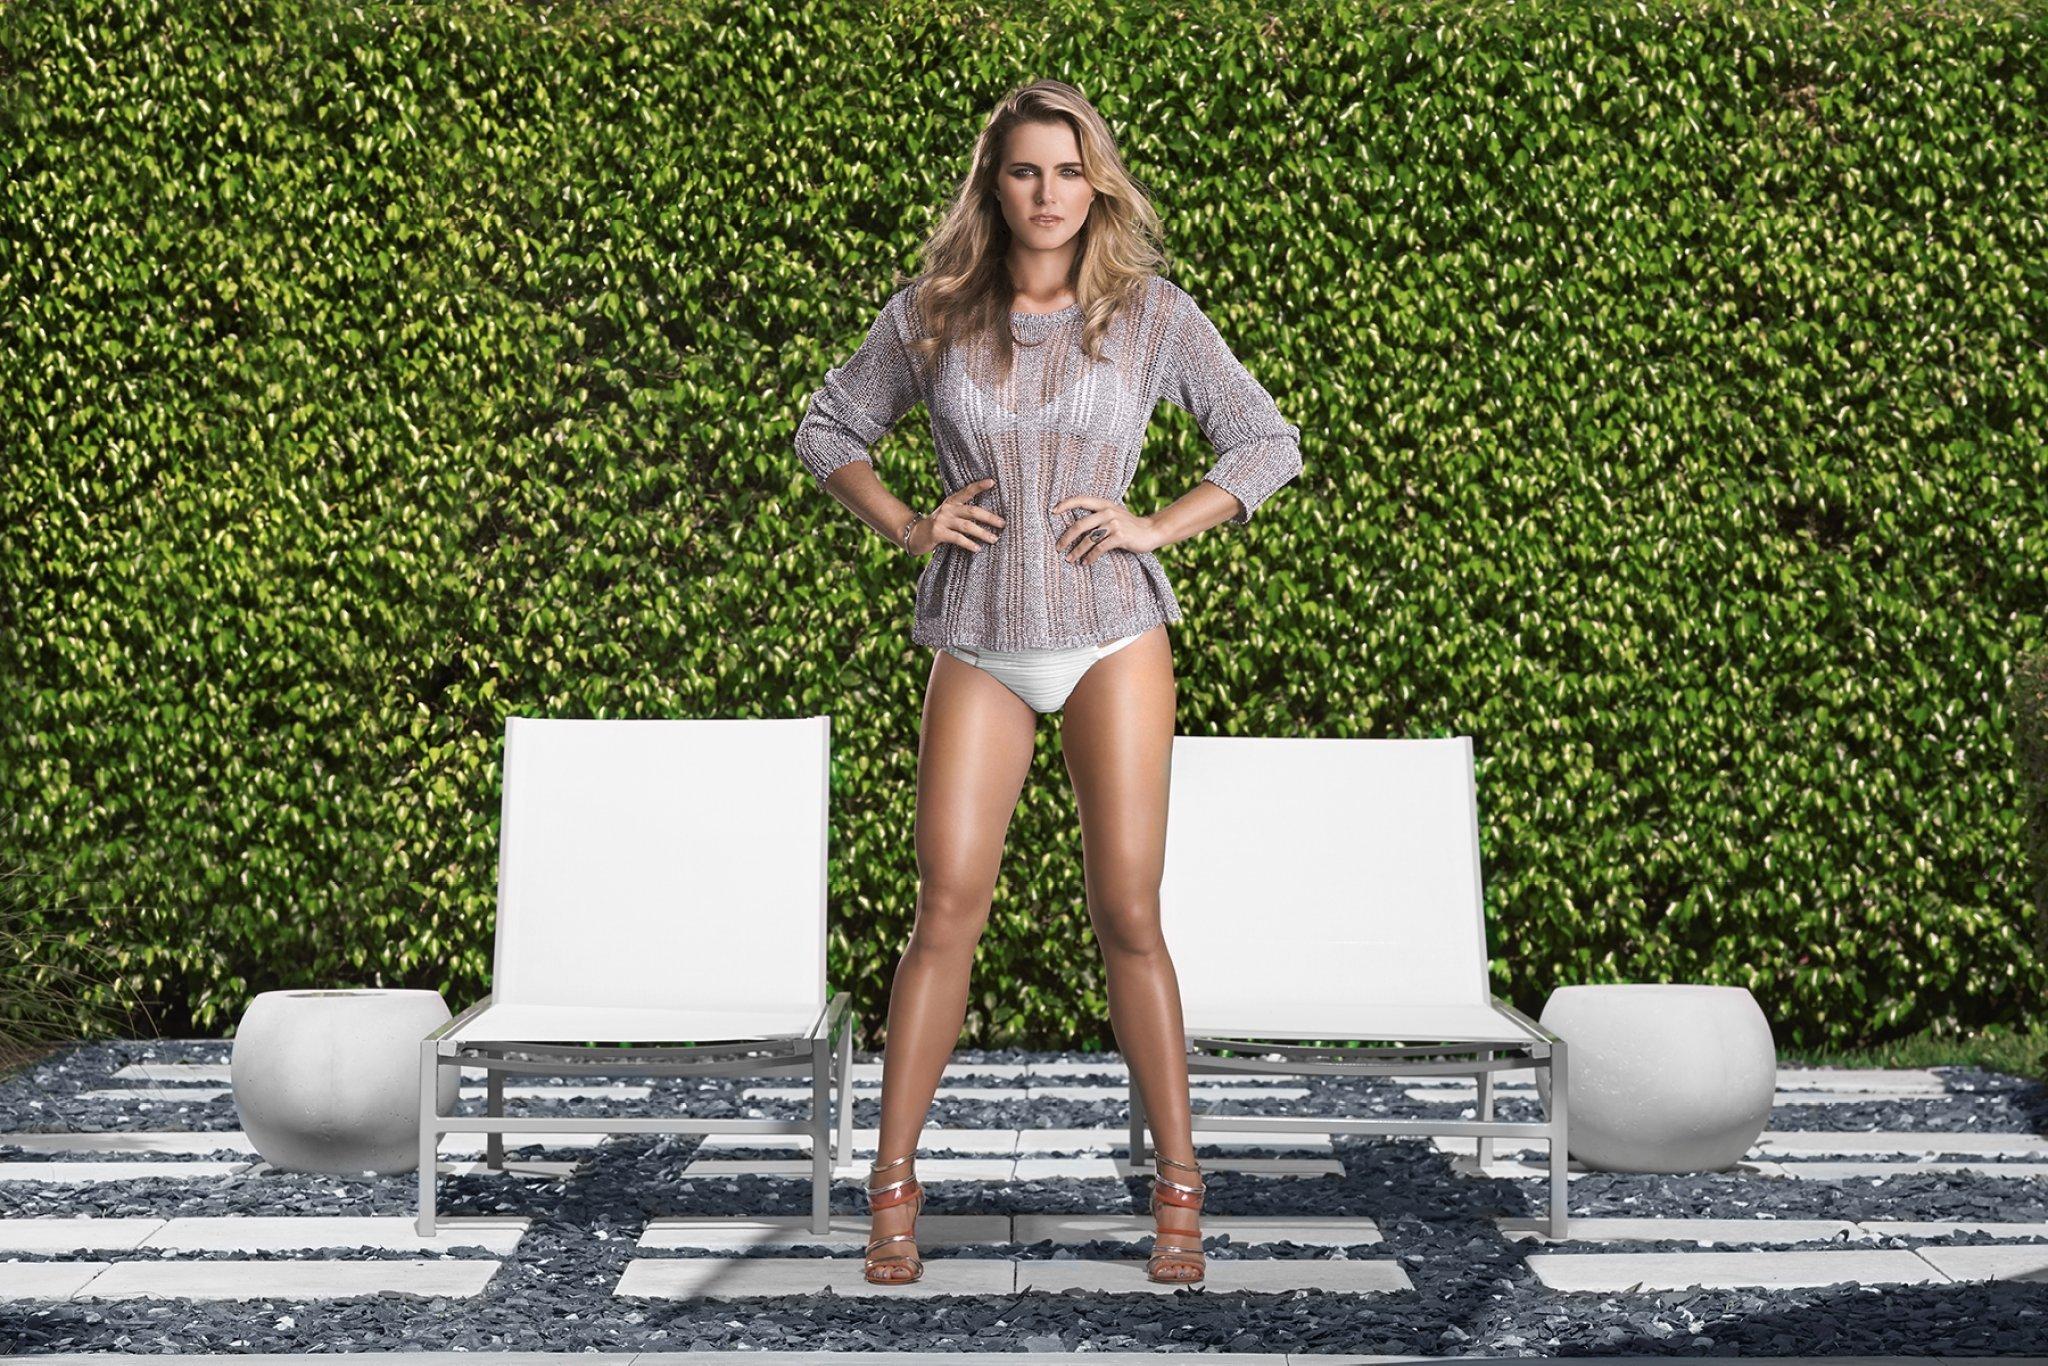 Feet Lexi Thompson naked (21 photos), Topless, Hot, Boobs, legs 2017